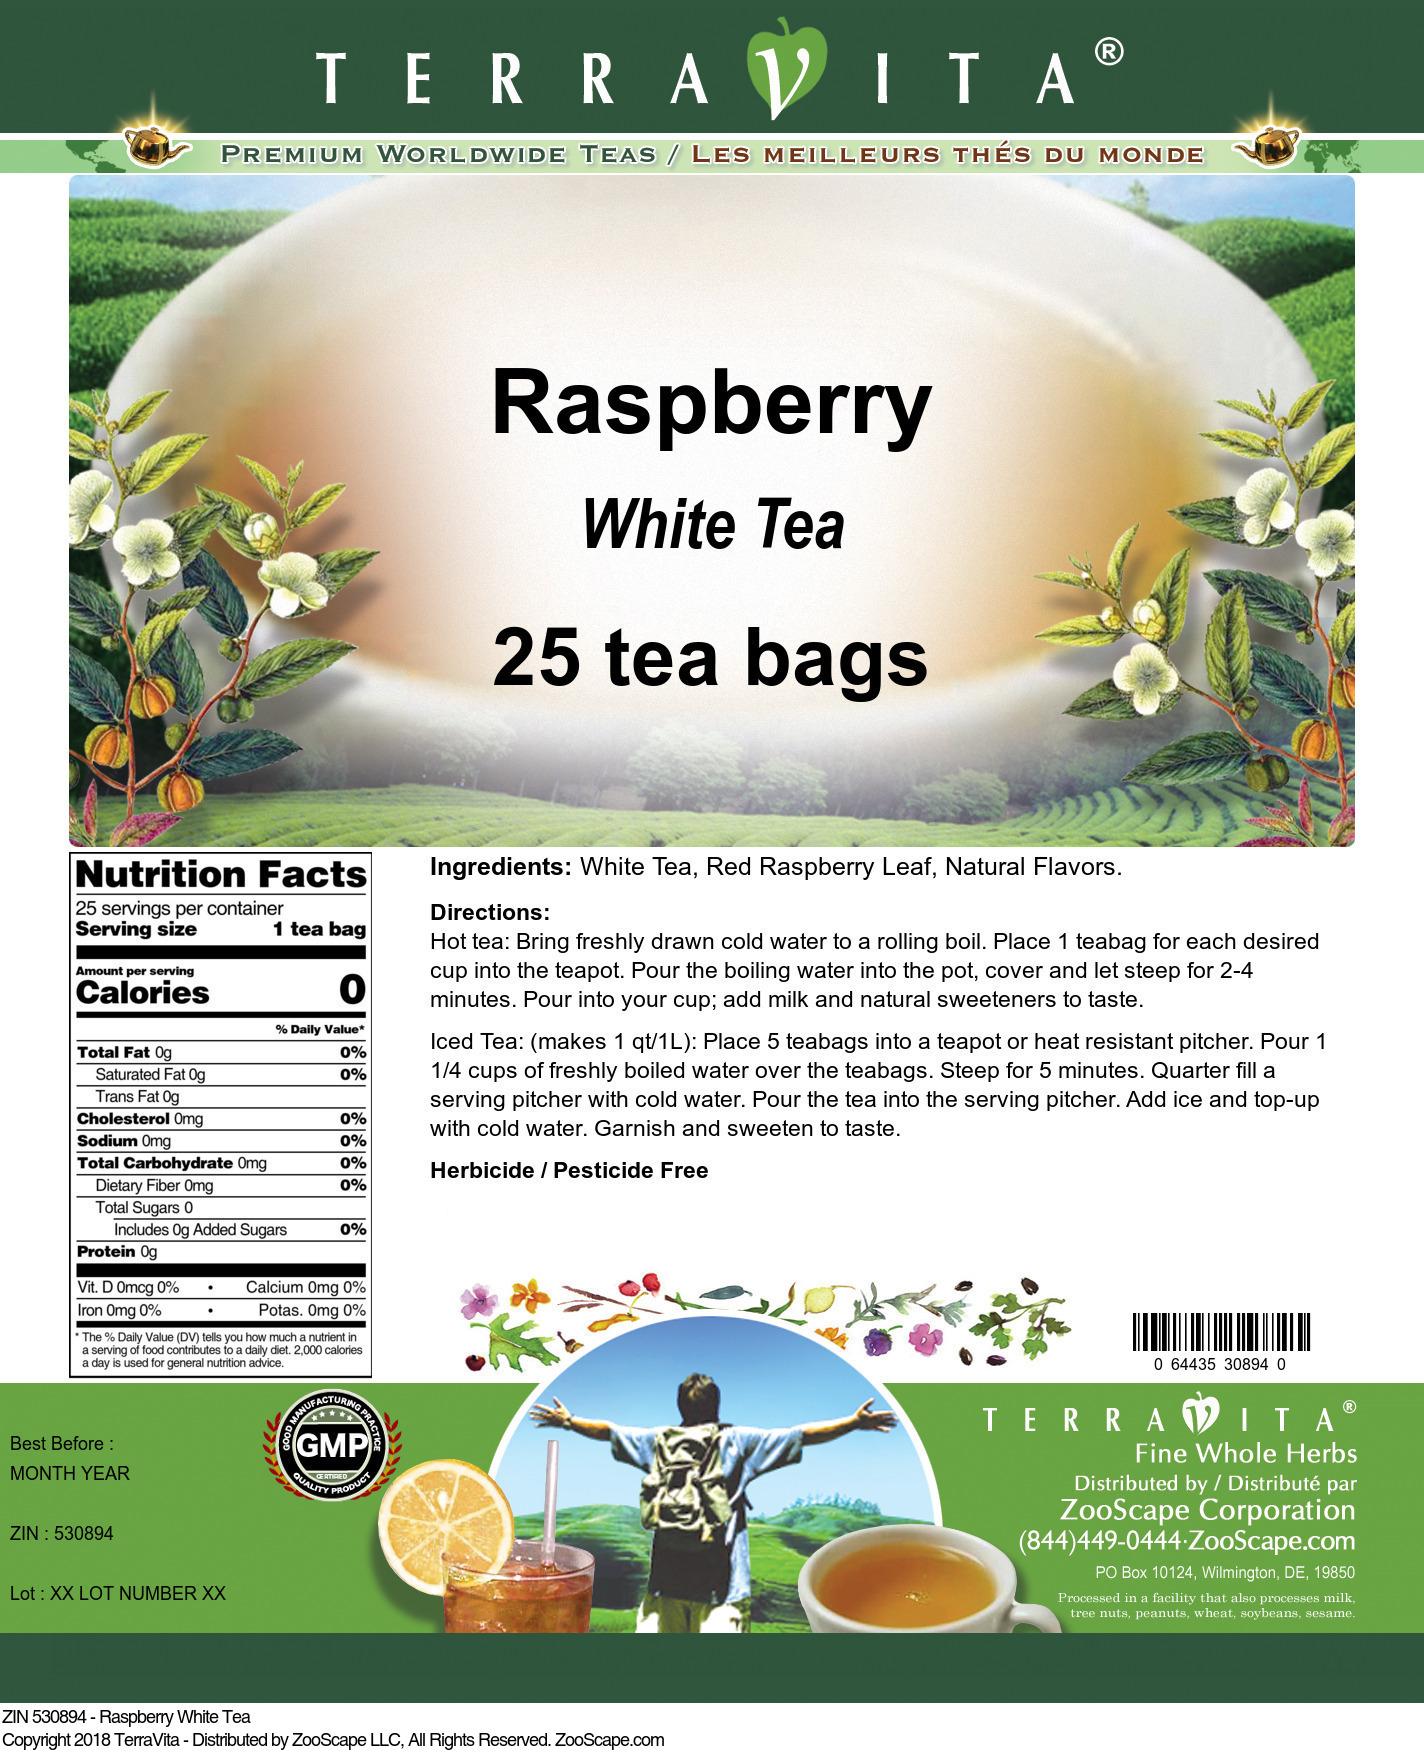 Raspberry White Tea